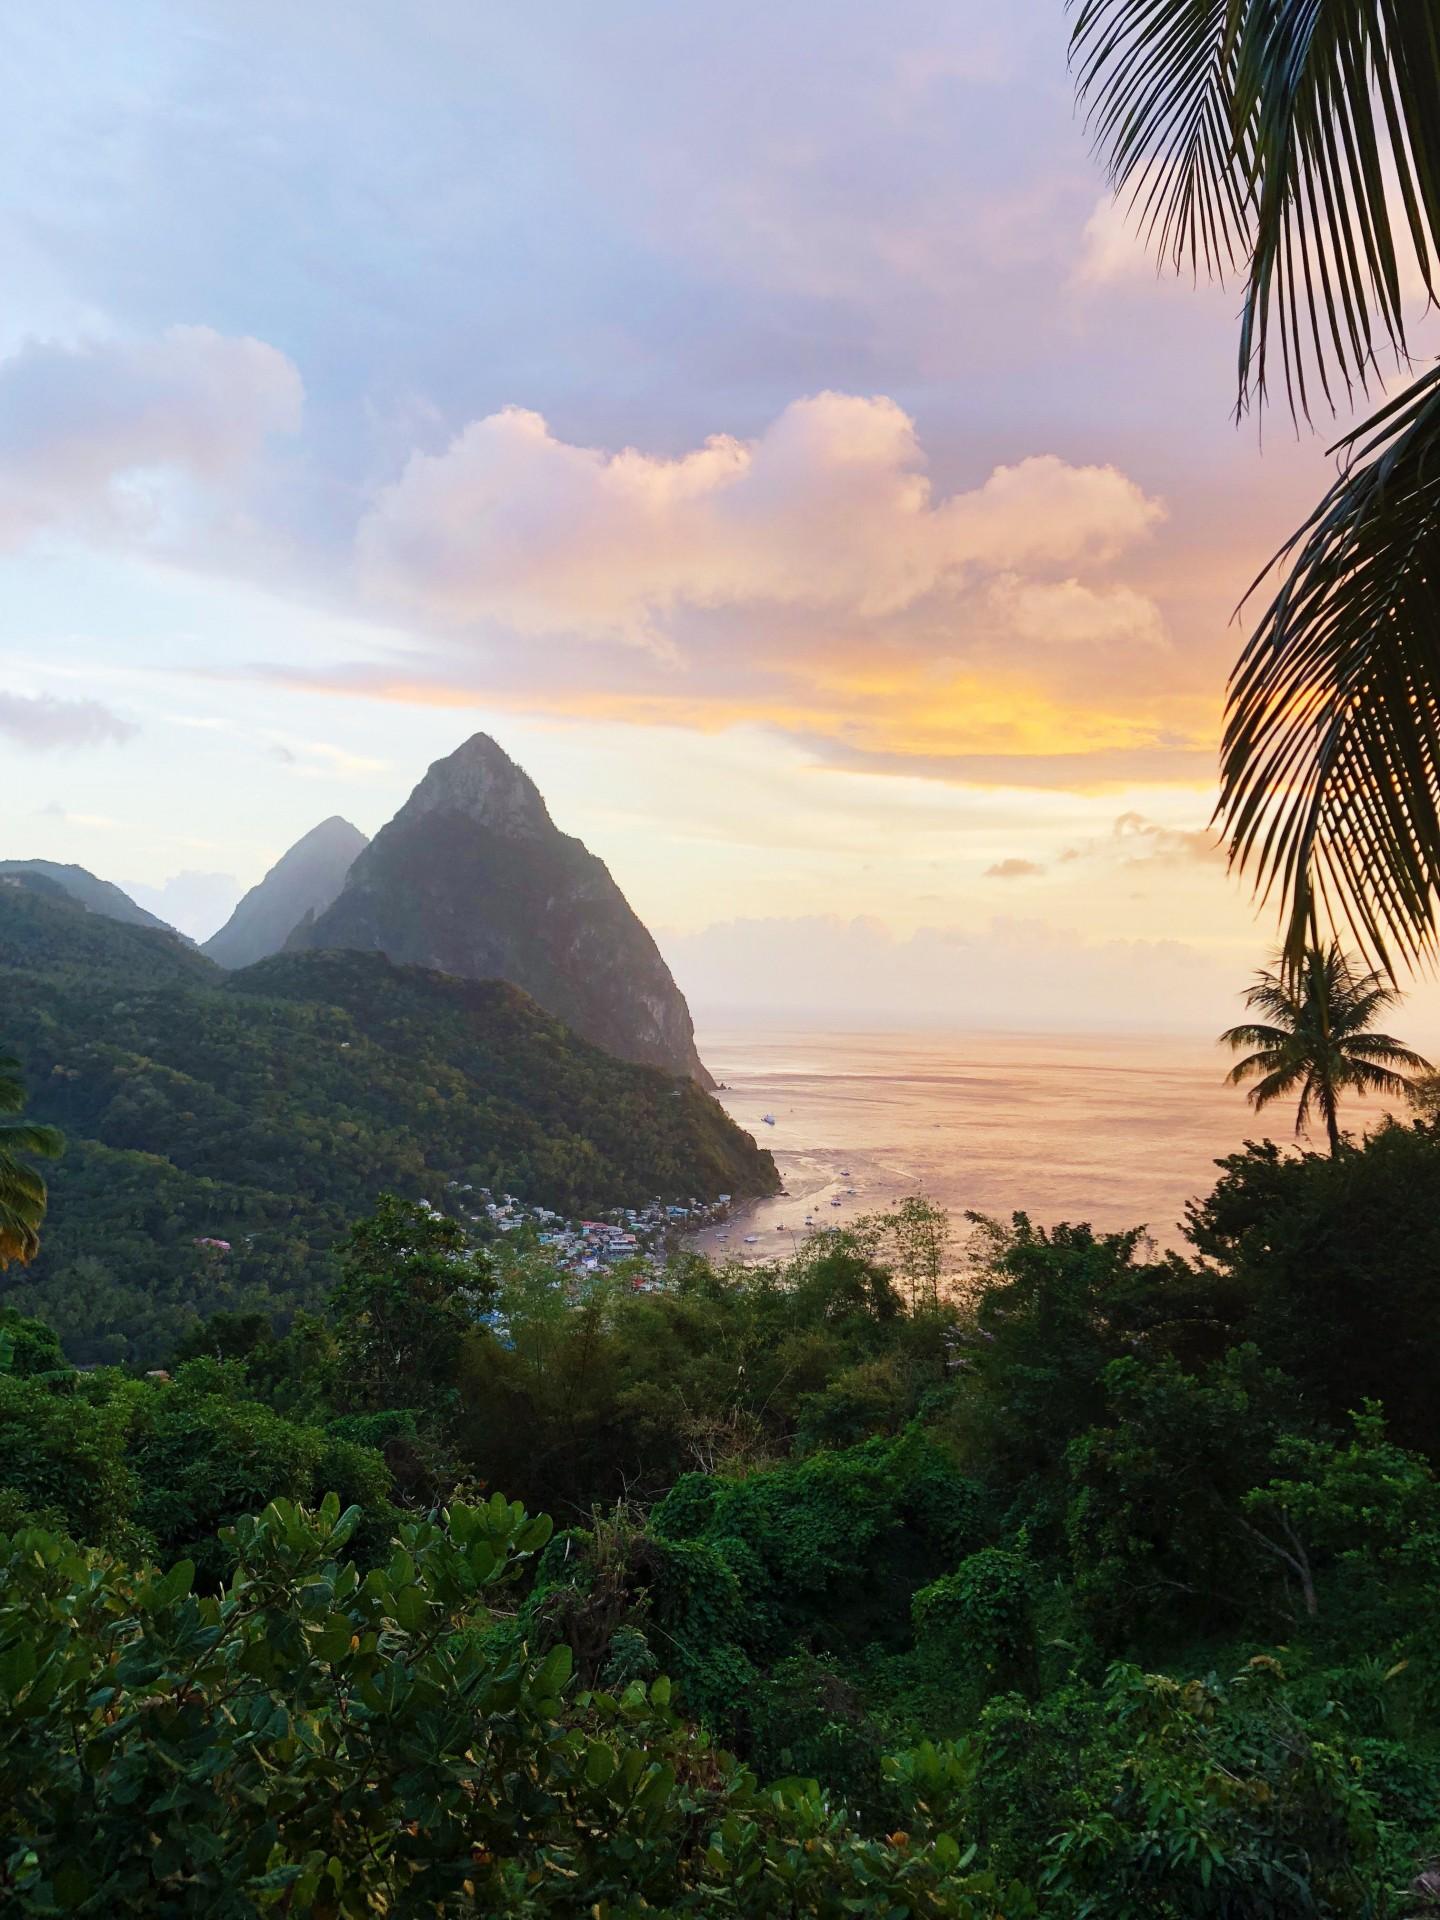 St.-Lucia-4-e1519321489500.jpg